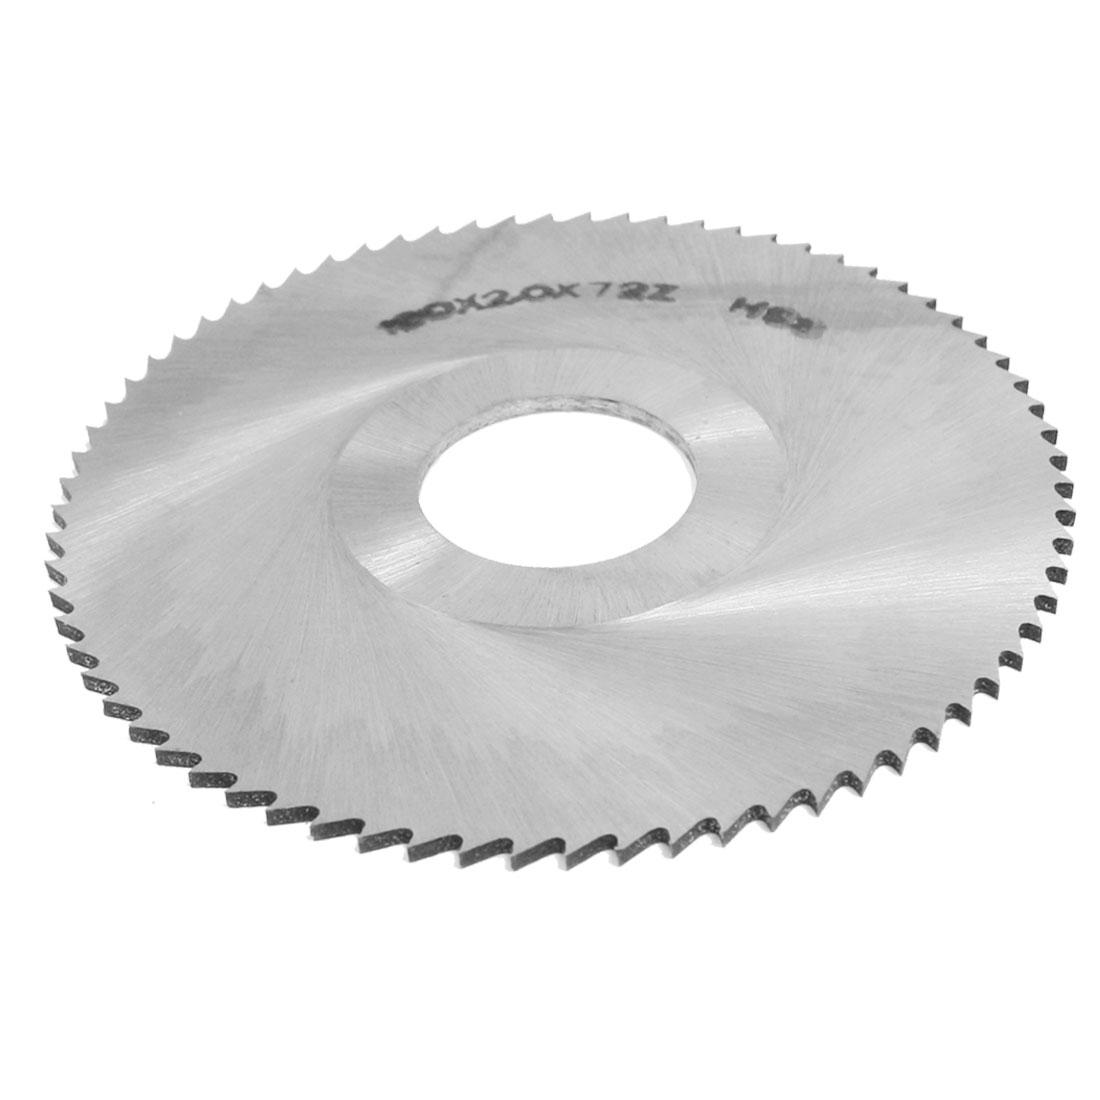 Slitting Slotting Saw Mill Cutter Disc HSS 100 x 2 x 27mm 72 Teeth